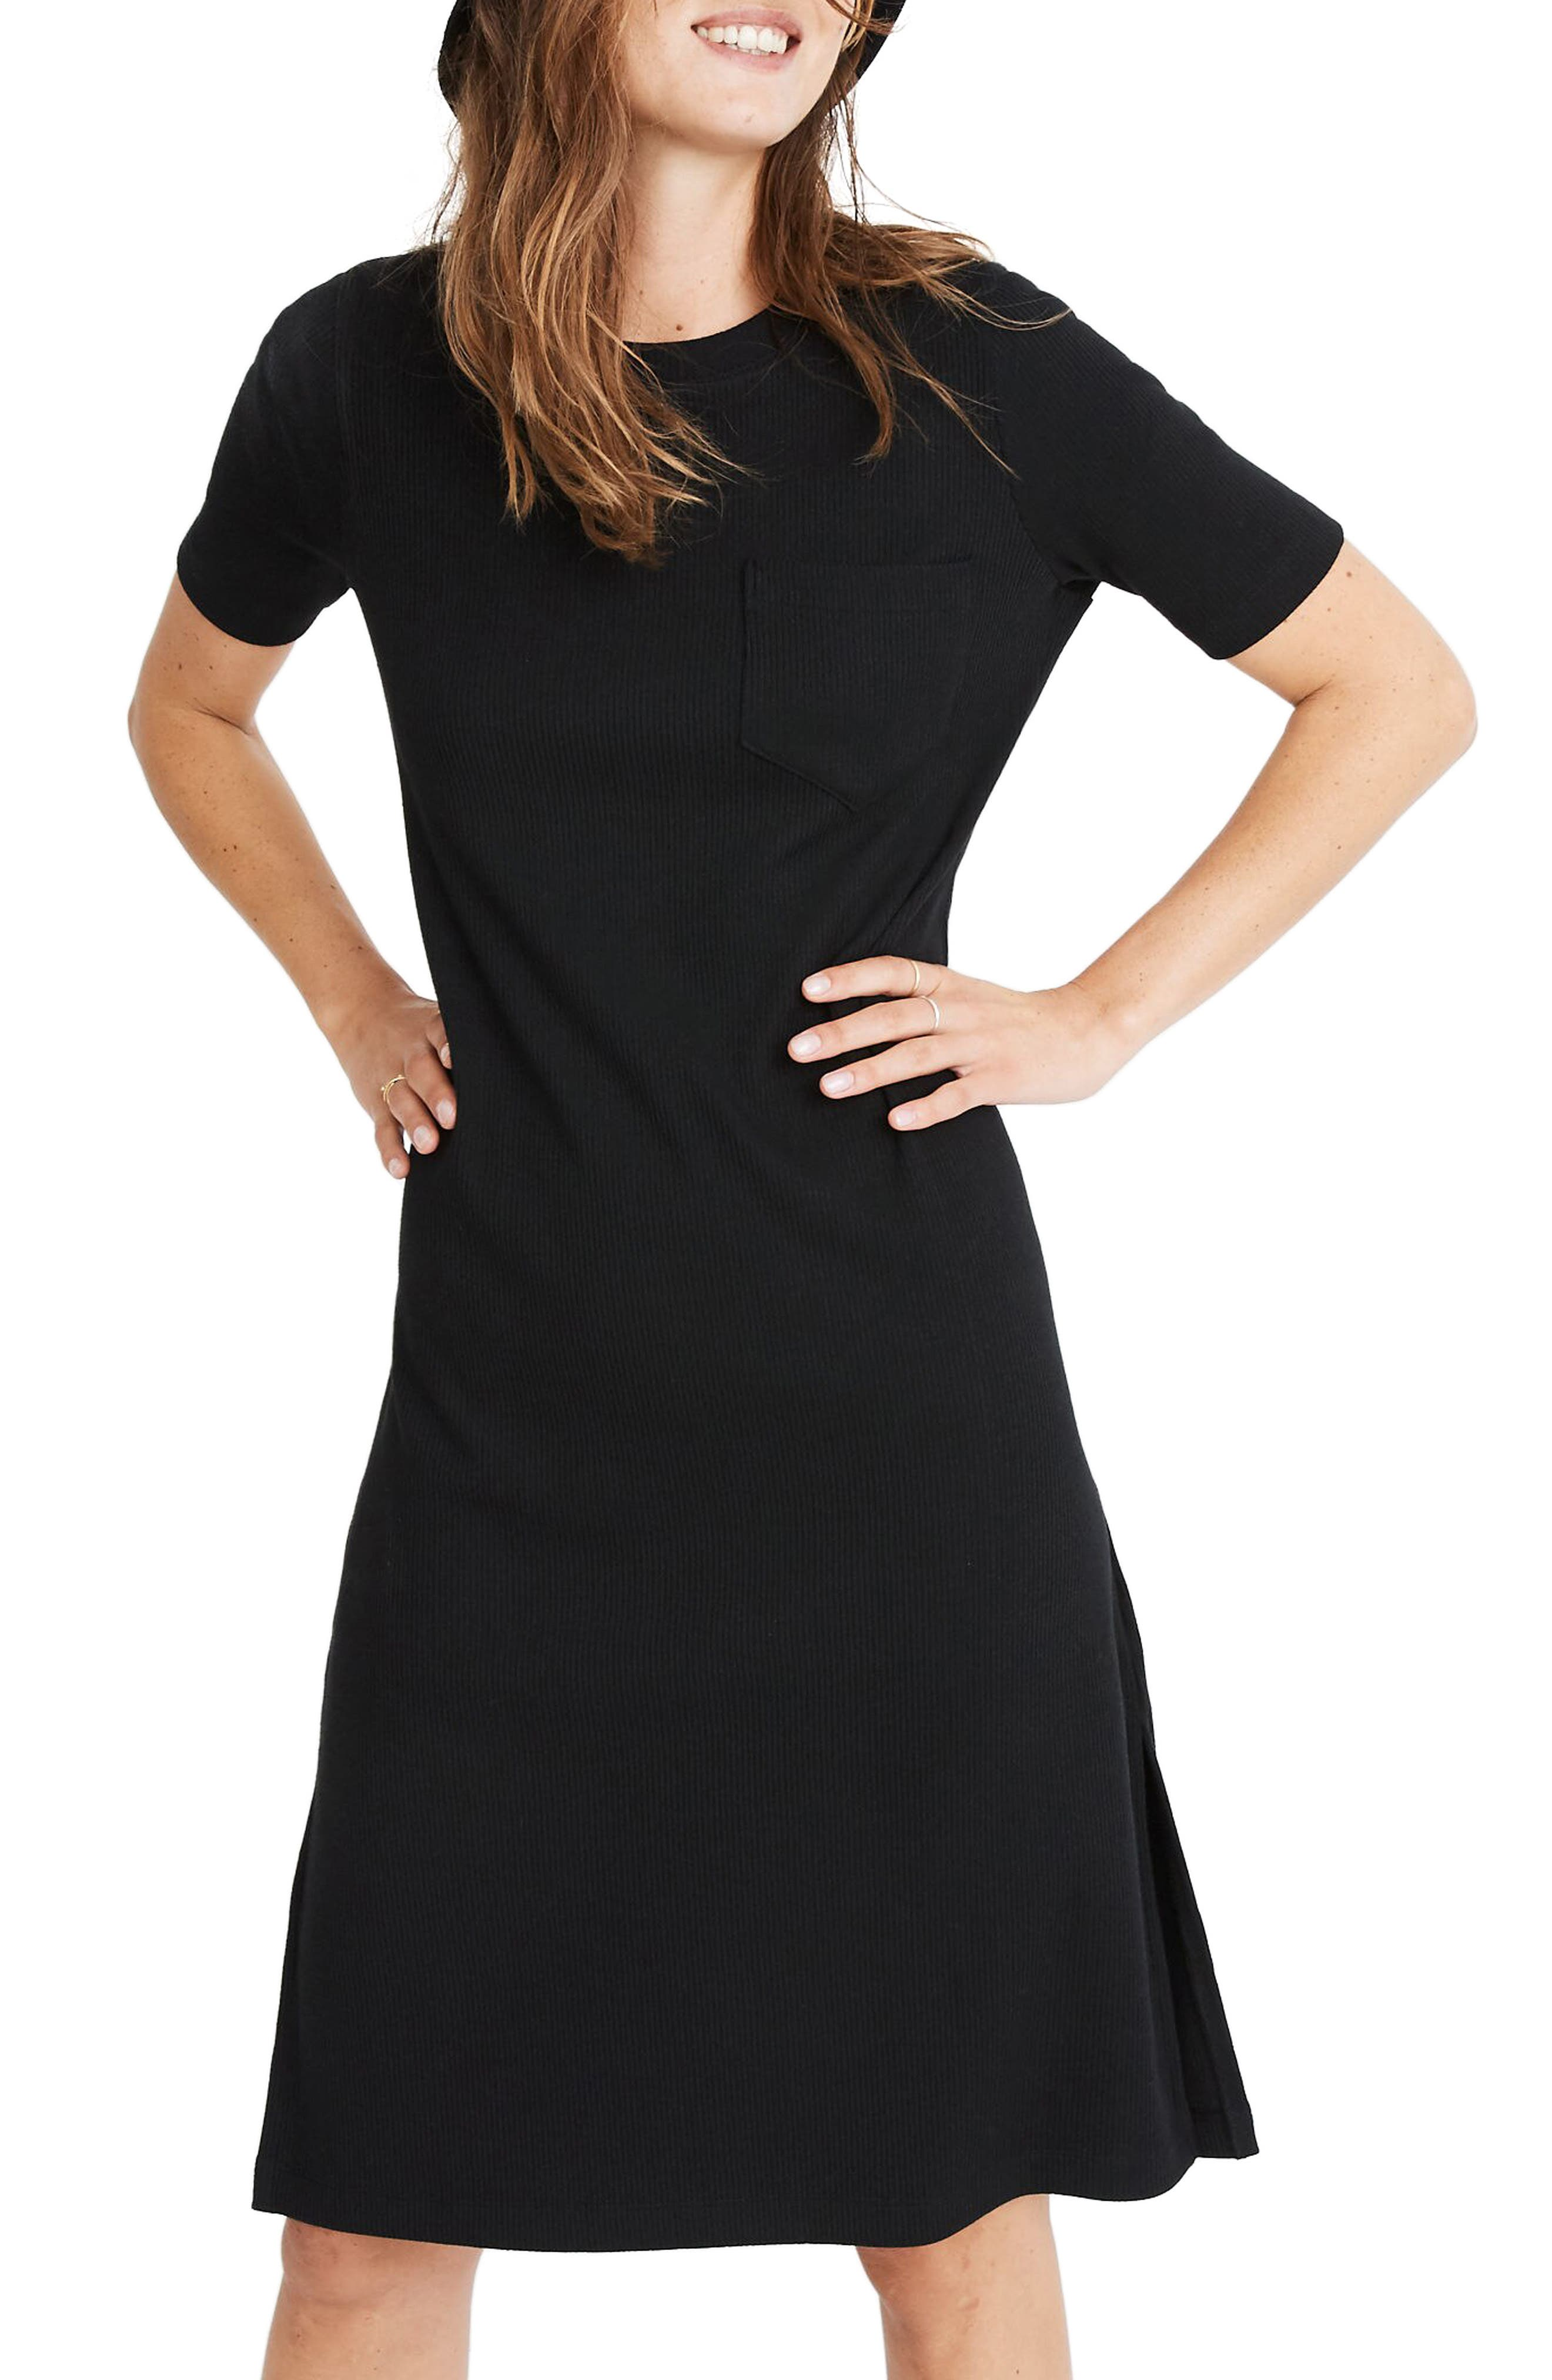 Image of Madewell Ribbed Pocket T-Shirt Dress